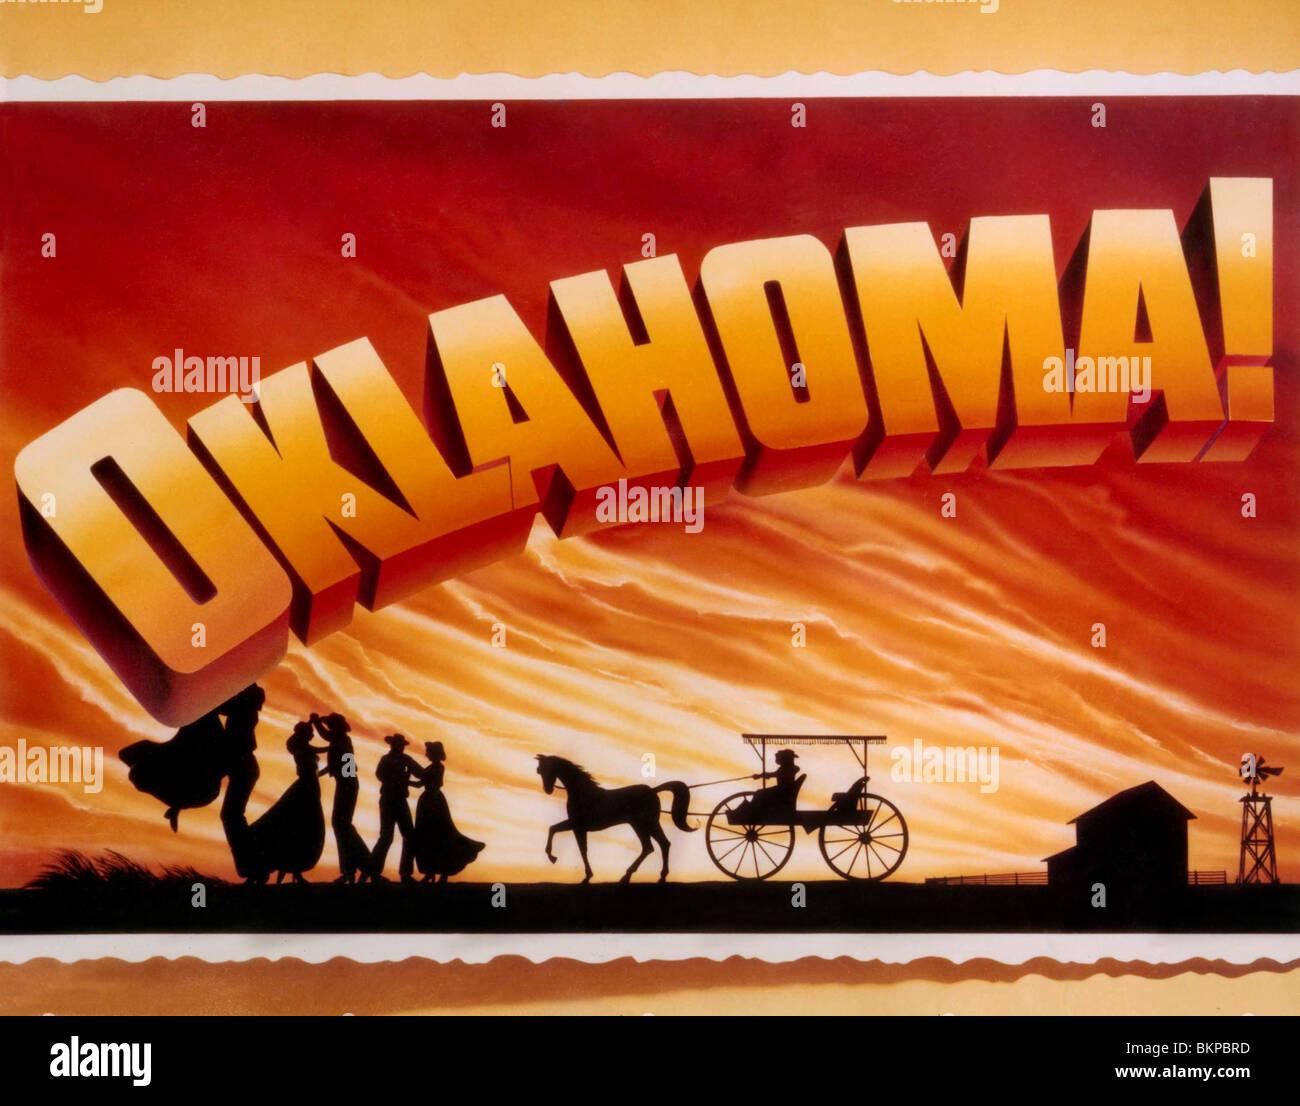 OKLAHOMA -1955 POSTER - Stock Image